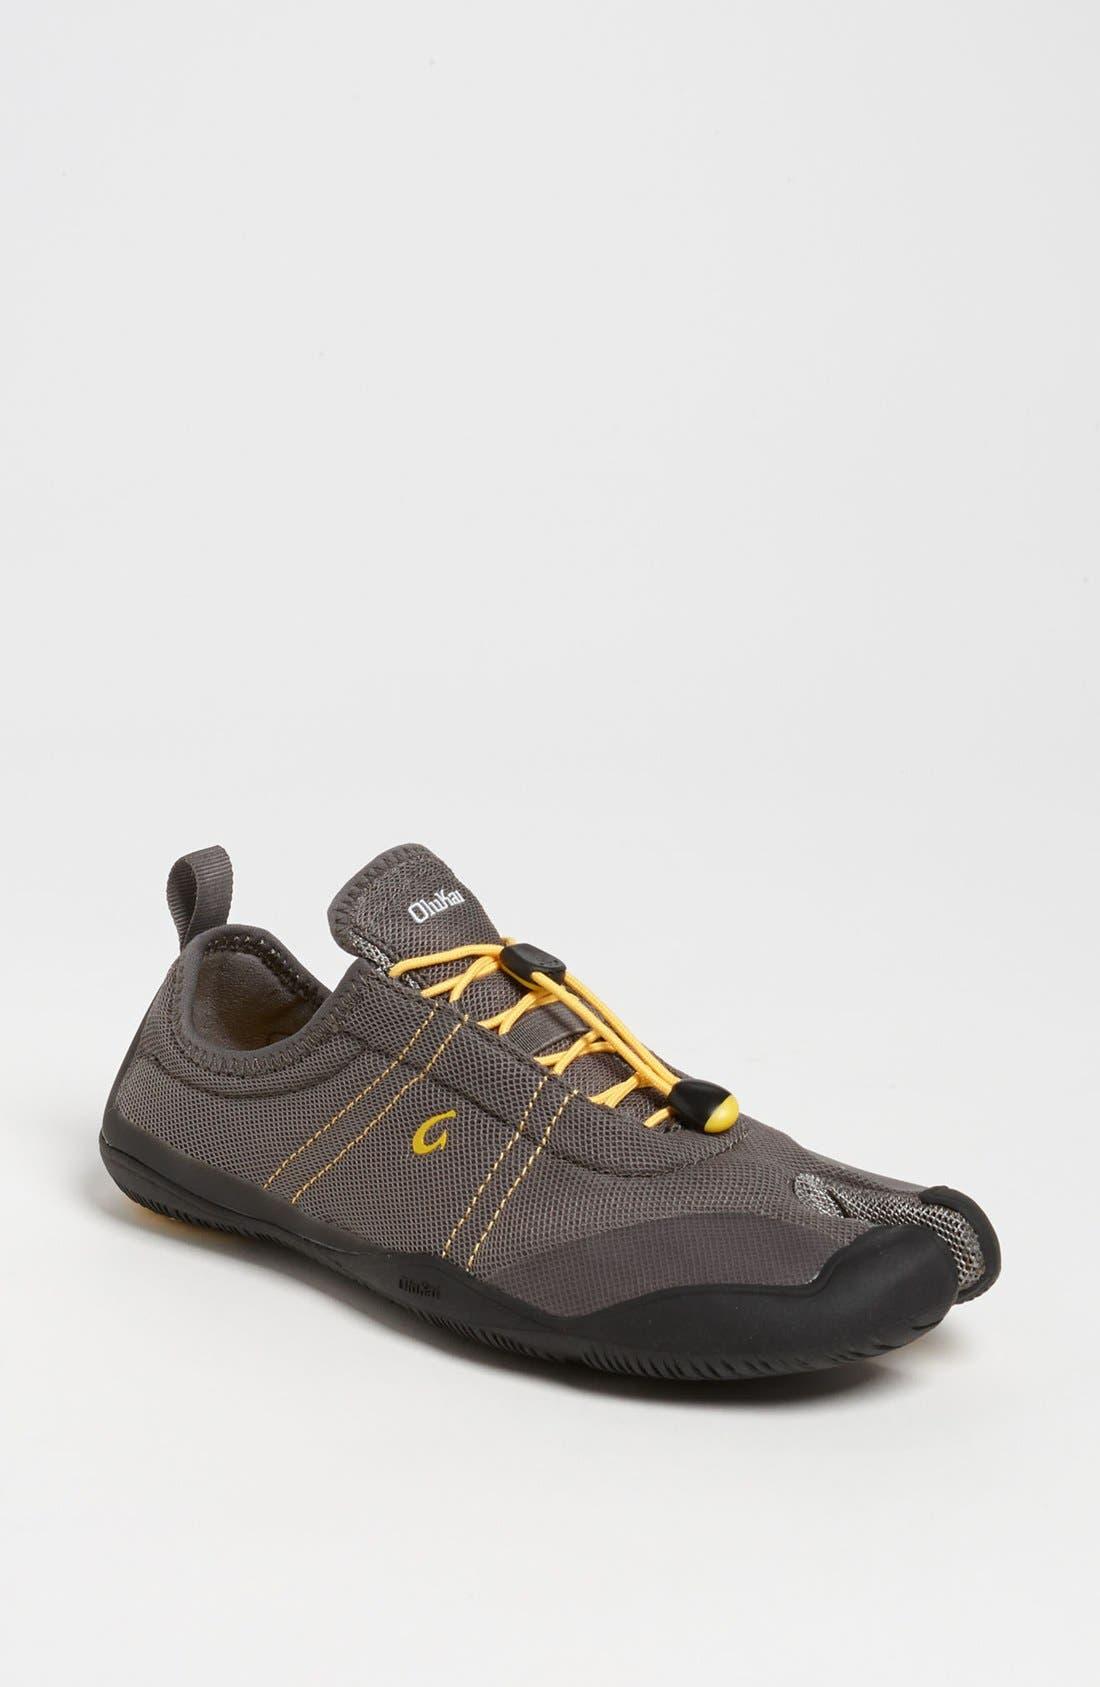 Main Image - OluKai 'Maliko' Sneaker (Men)